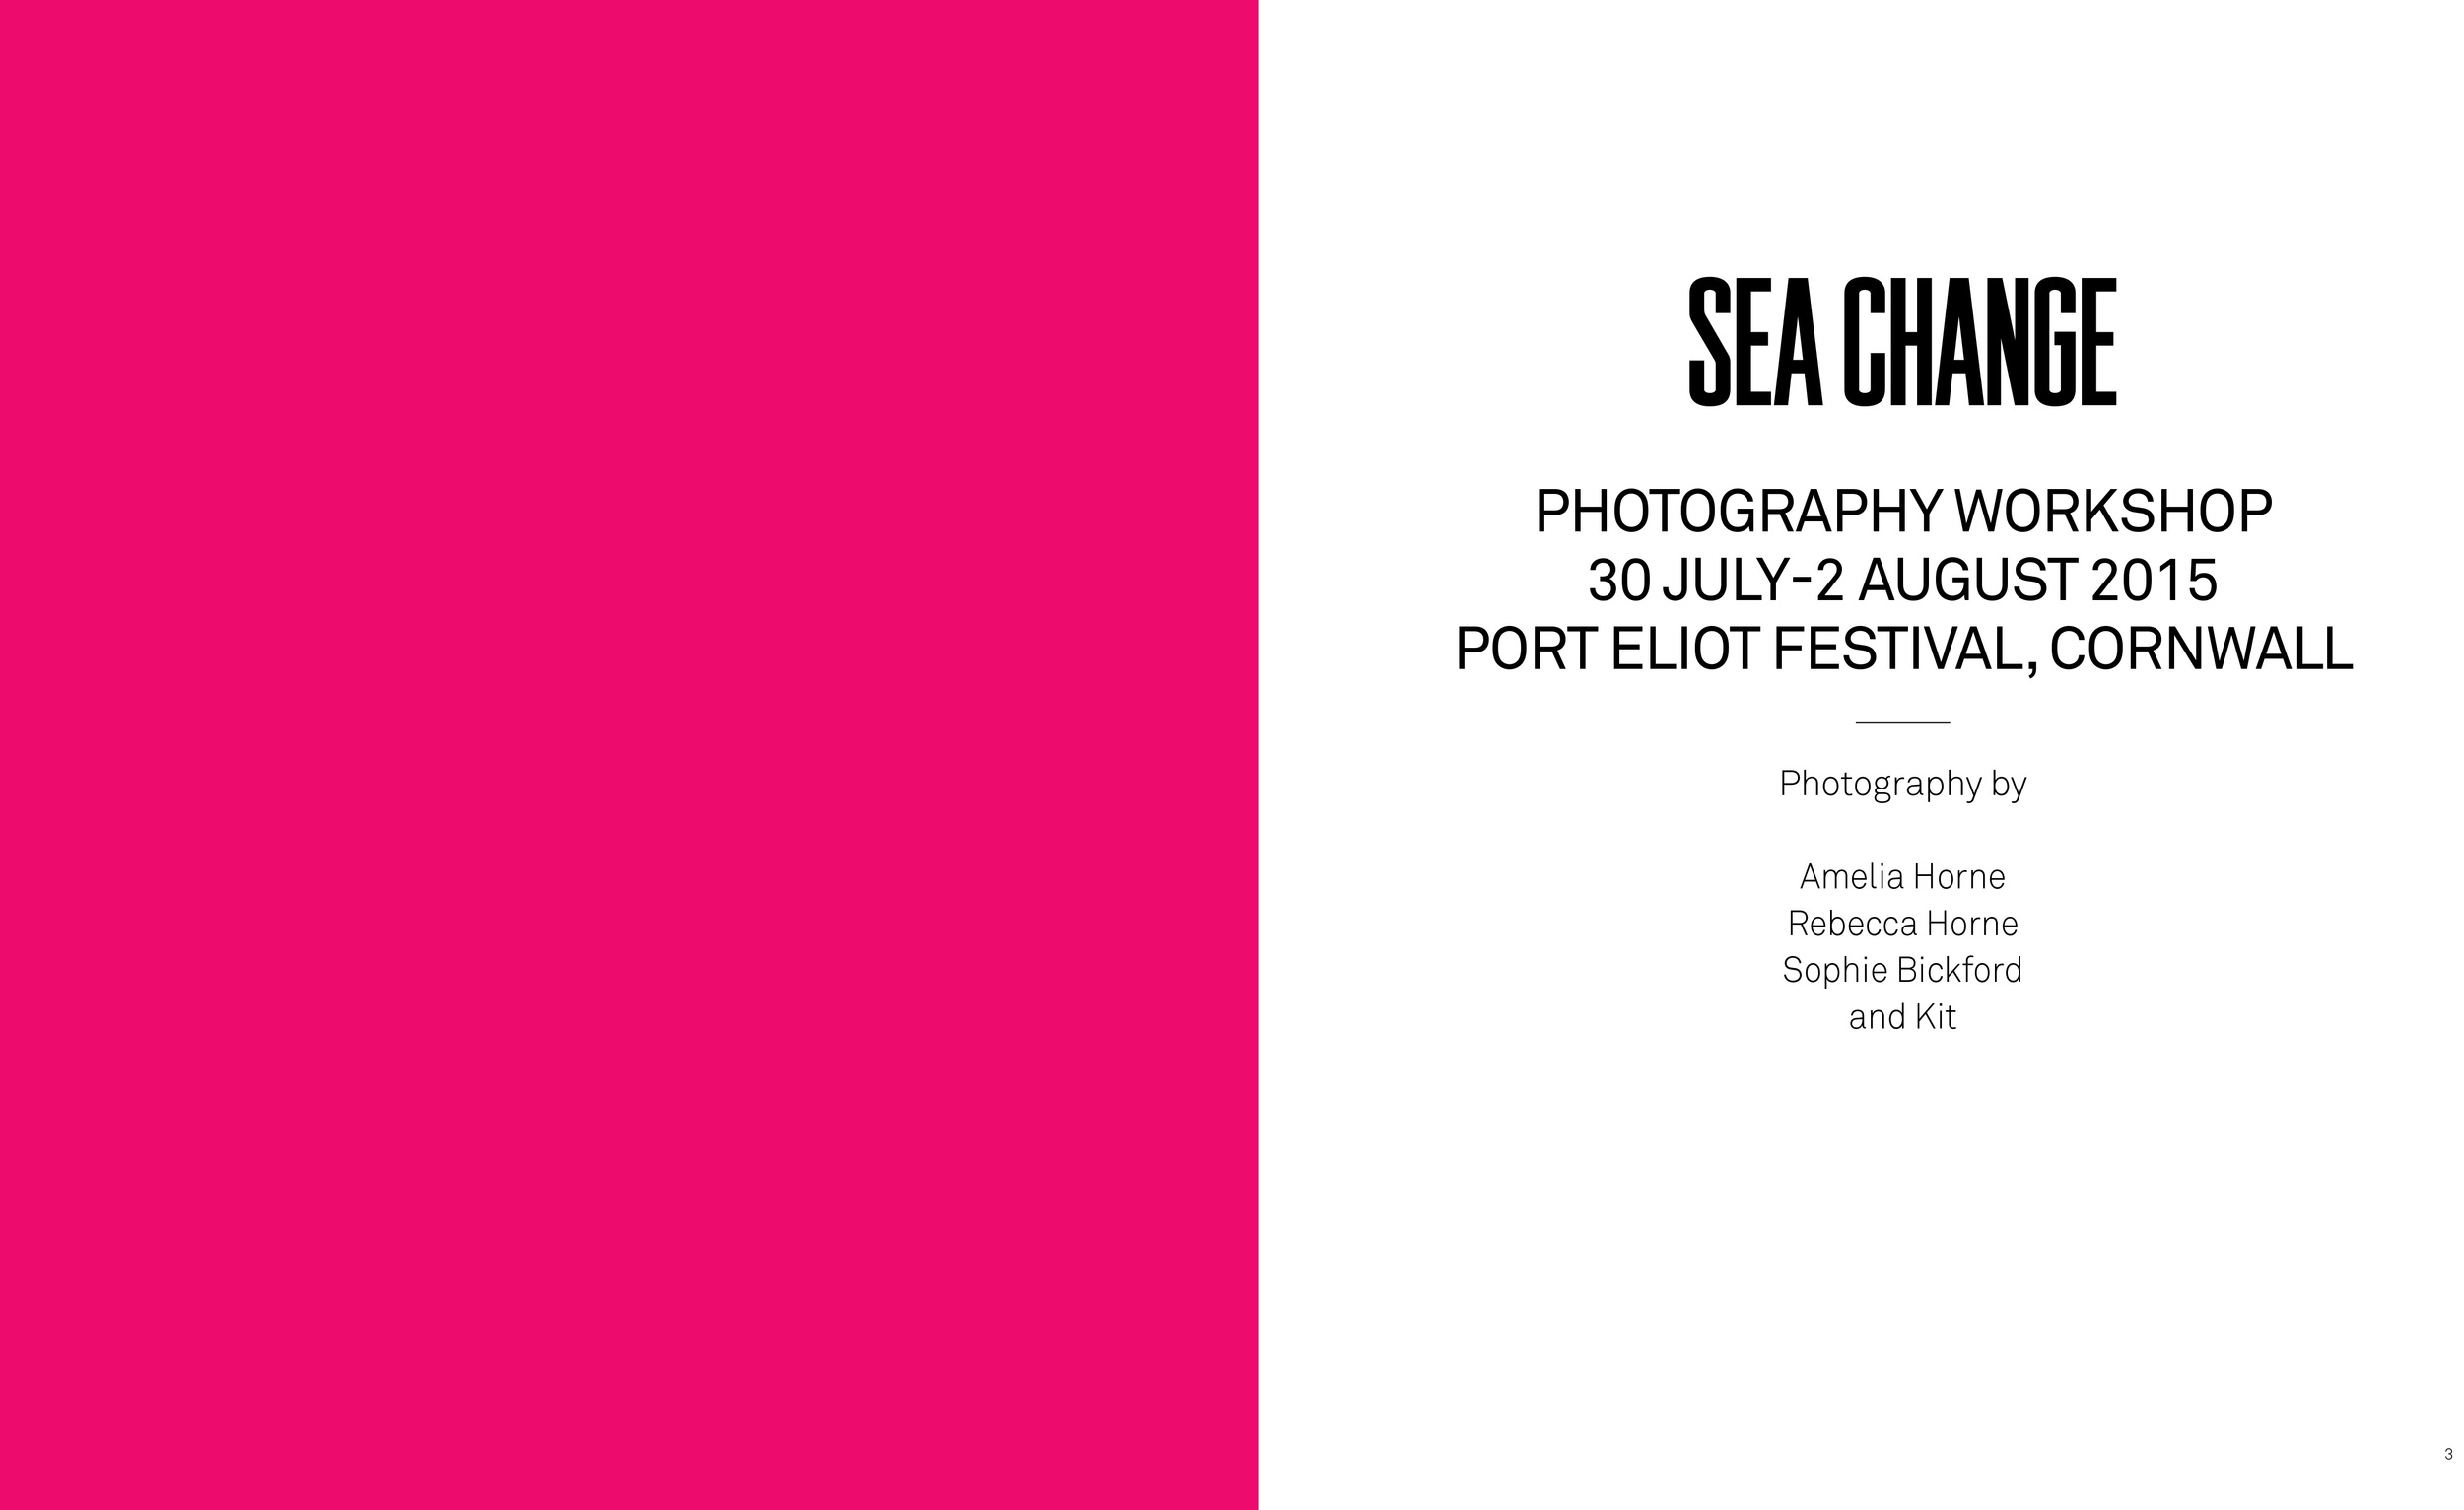 Sea Change Port Eliot v2-2 copy.jpg